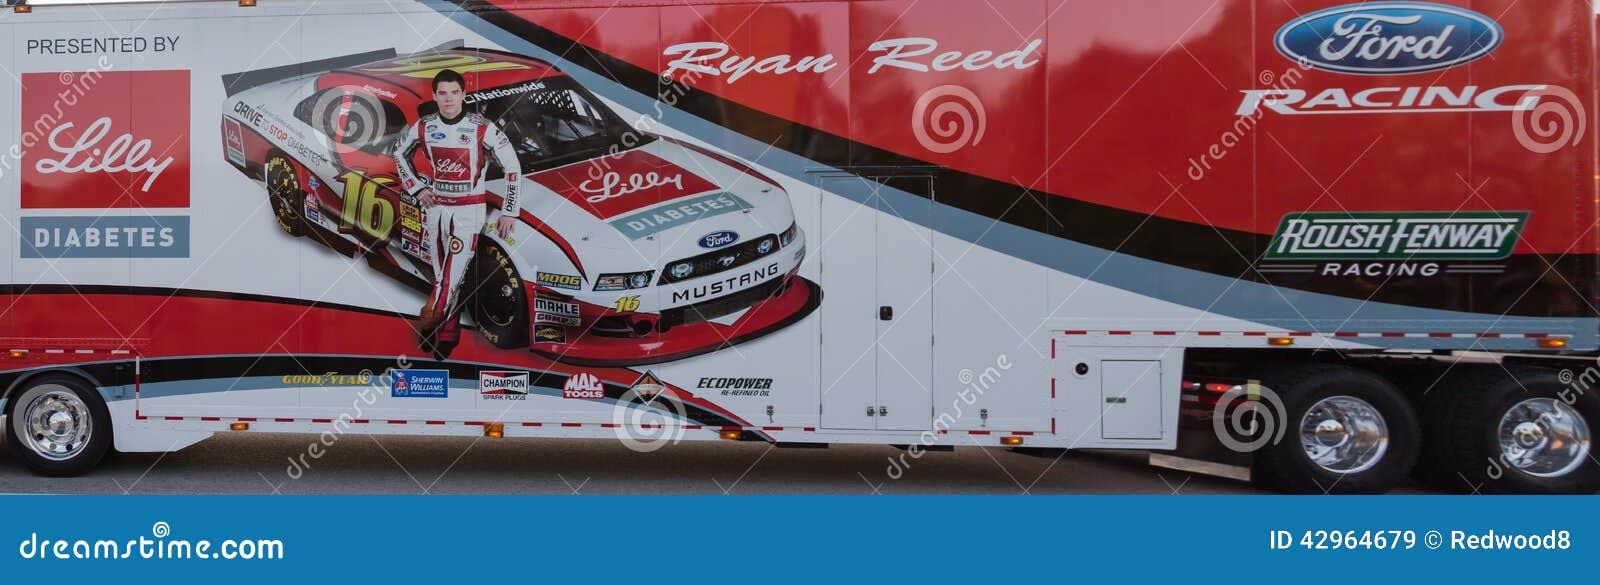 Ryan Reed NASCAR Hauler editorial stock image. Image of lilly - 42964679